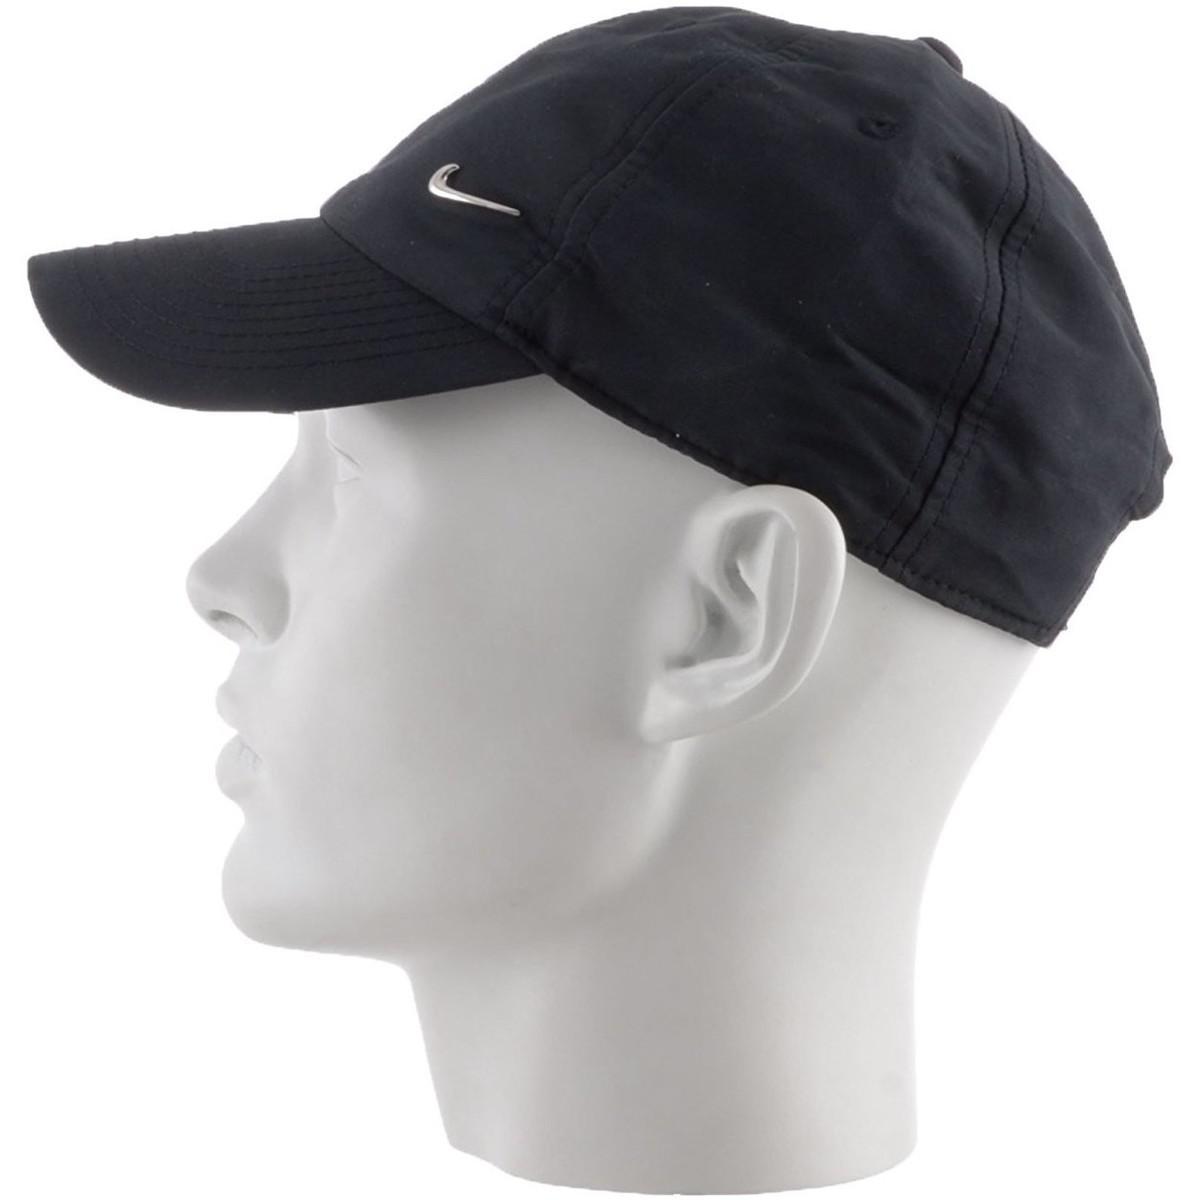 Nike Metal Swoosh Cap - Gorra Para Unisex Talla Men s Cap In Black ... 26fd3248d2c